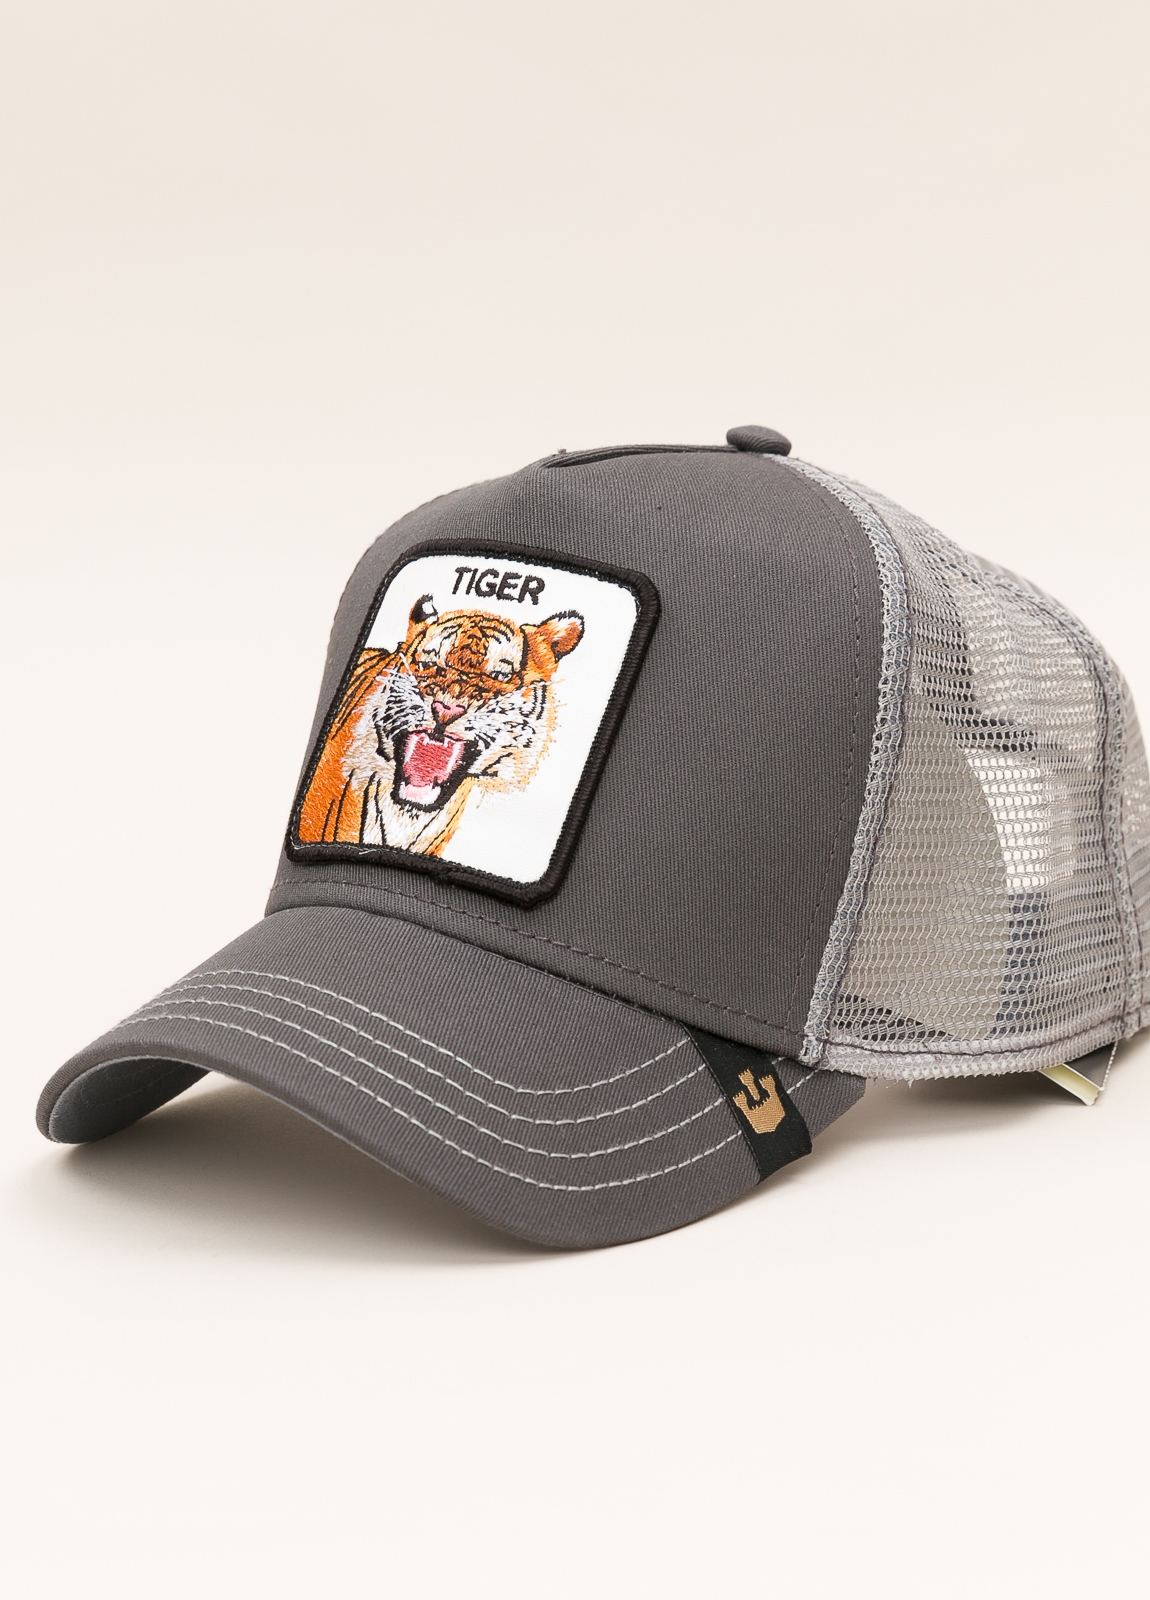 Gorra Trucker GOORIN BROS gris dibujo tigre - Ítem1